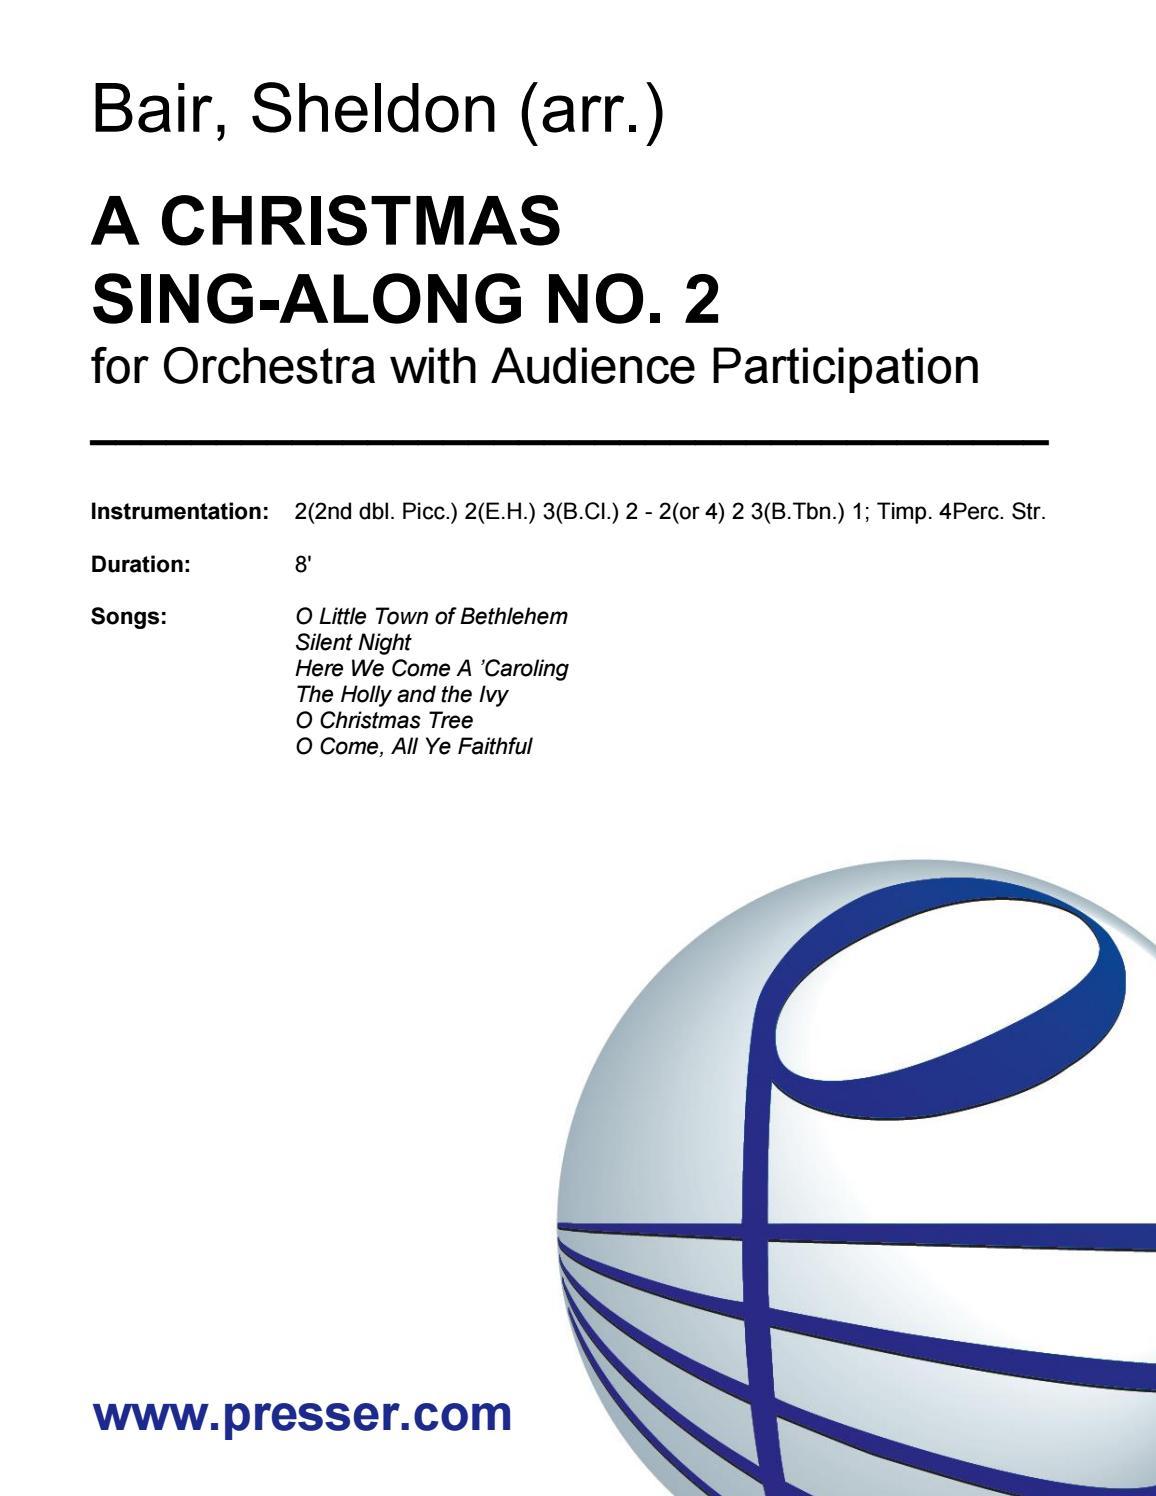 Bair: A Christmas Sing-Along No. 2 by Theodore Presser Co. - issuu